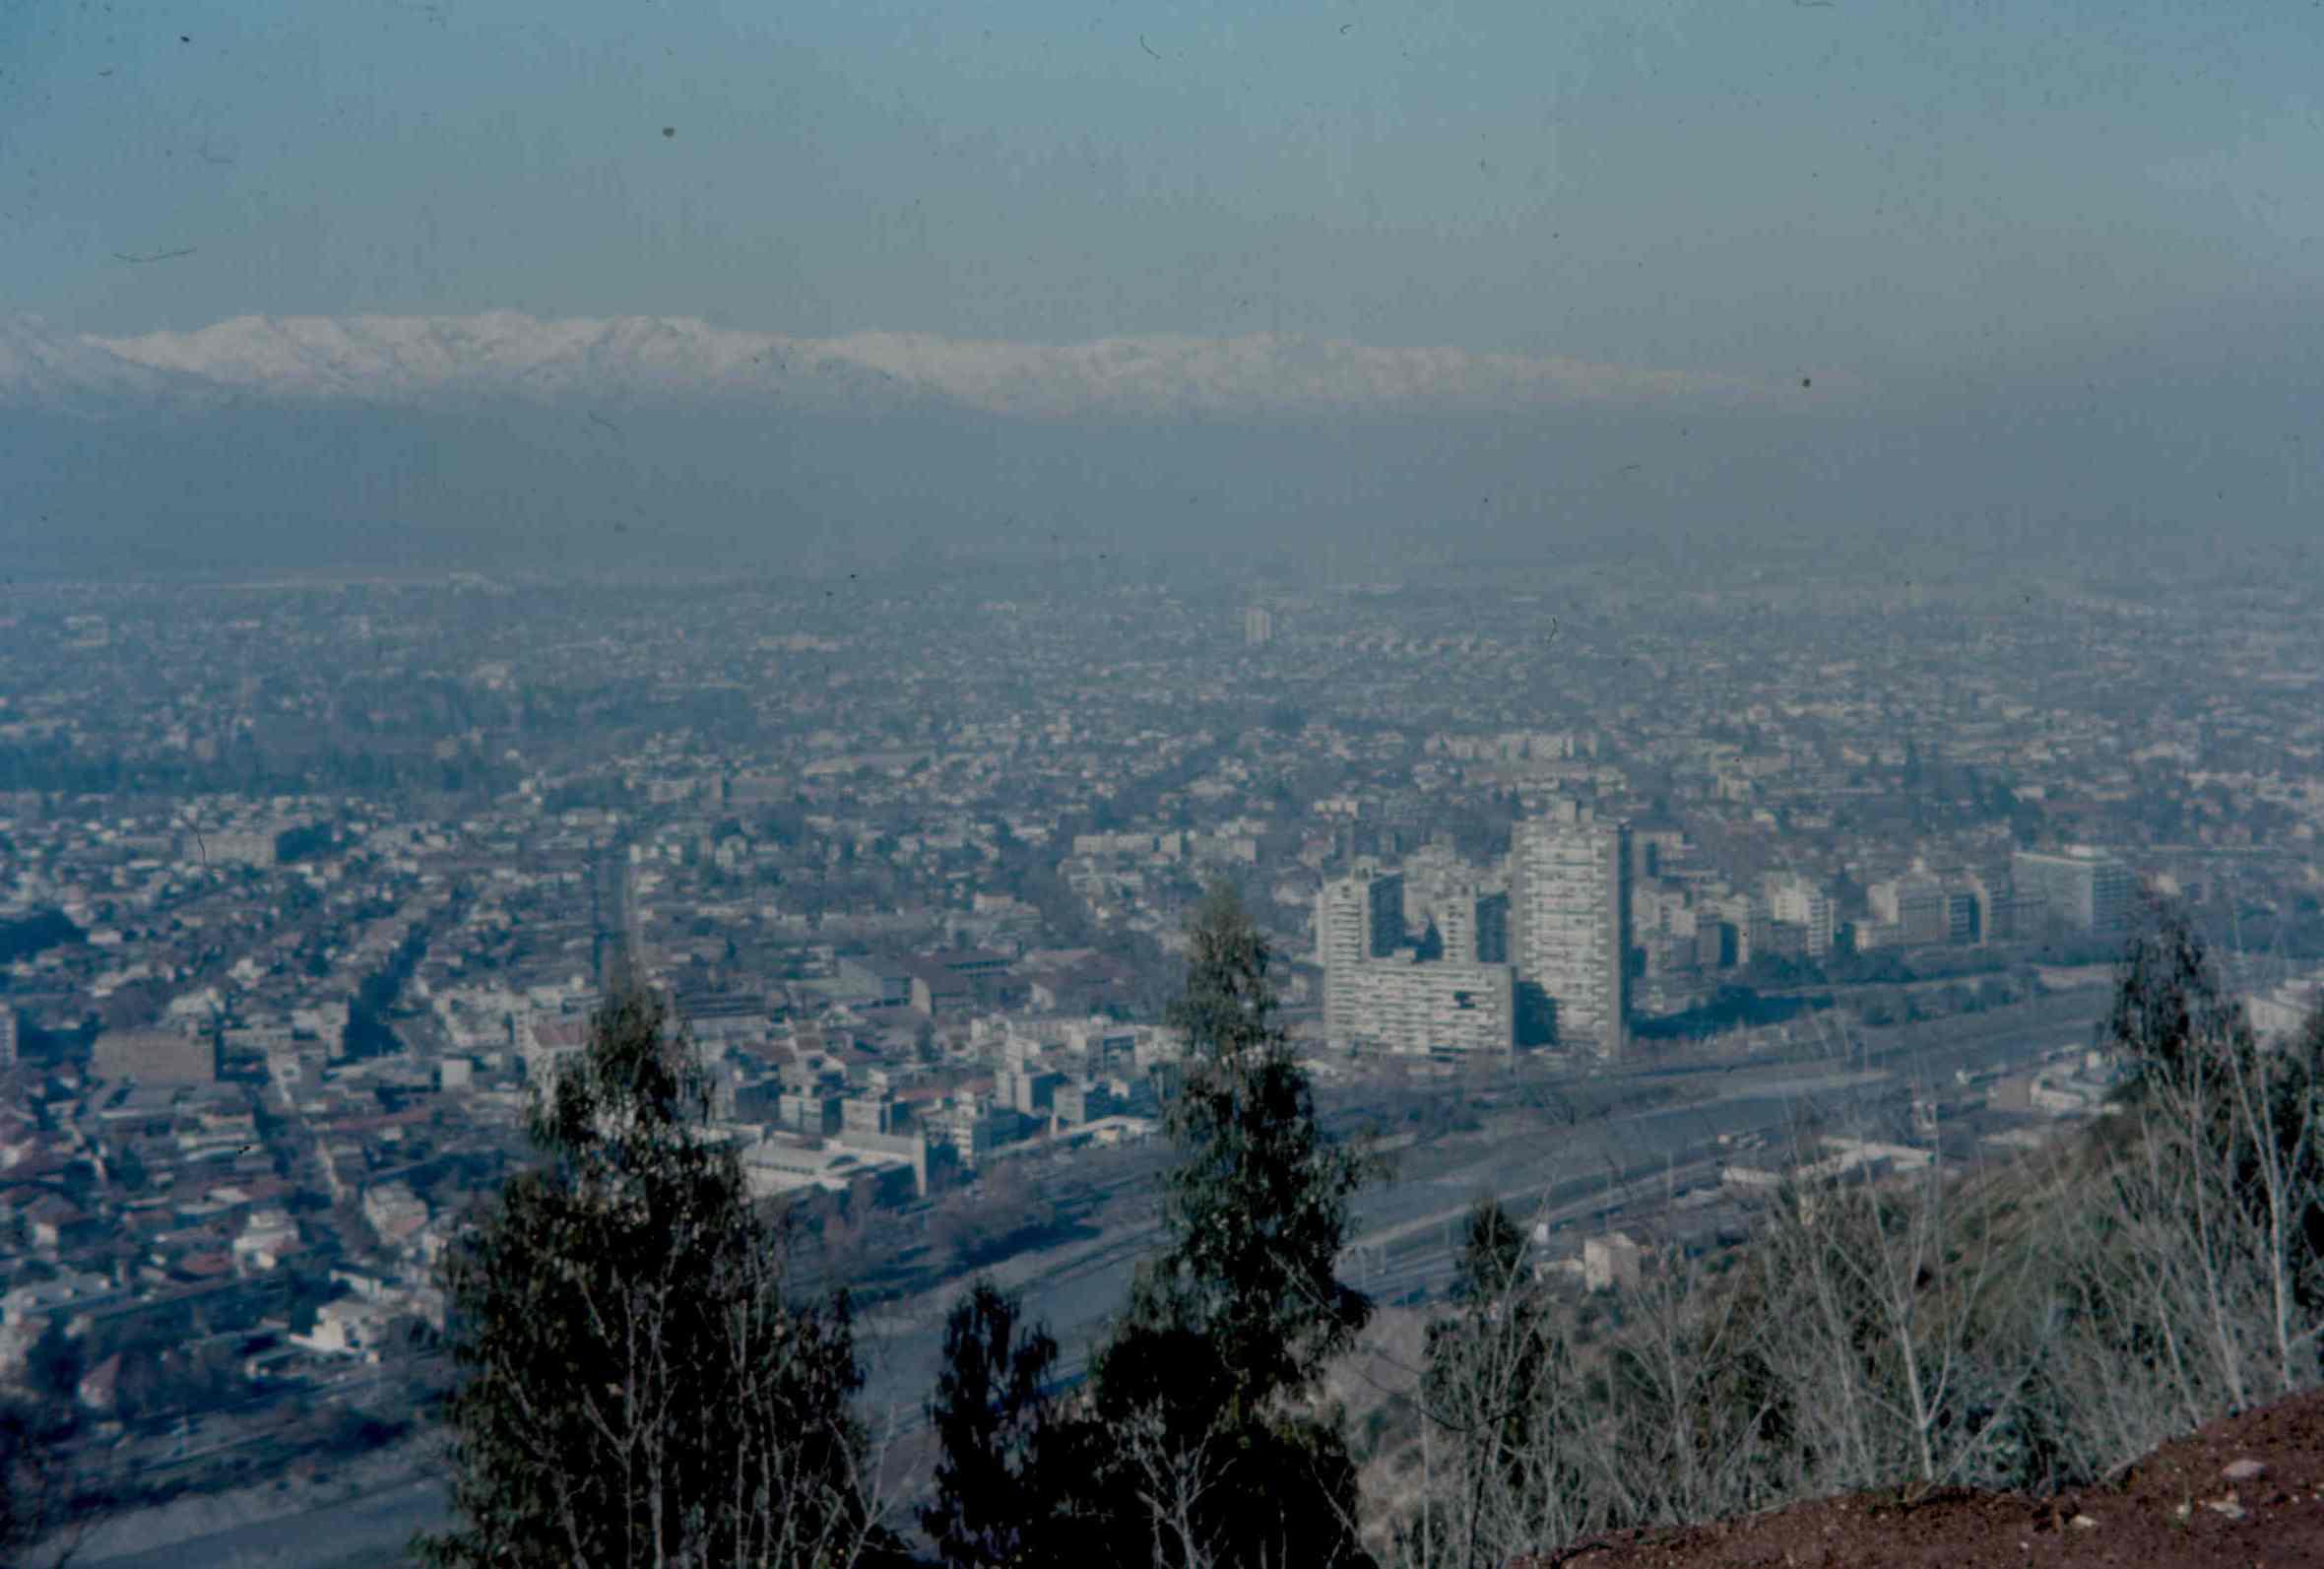 Enterreno - Fotos históricas de chile - fotos antiguas de Chile - Panorama de Providencia en 1969